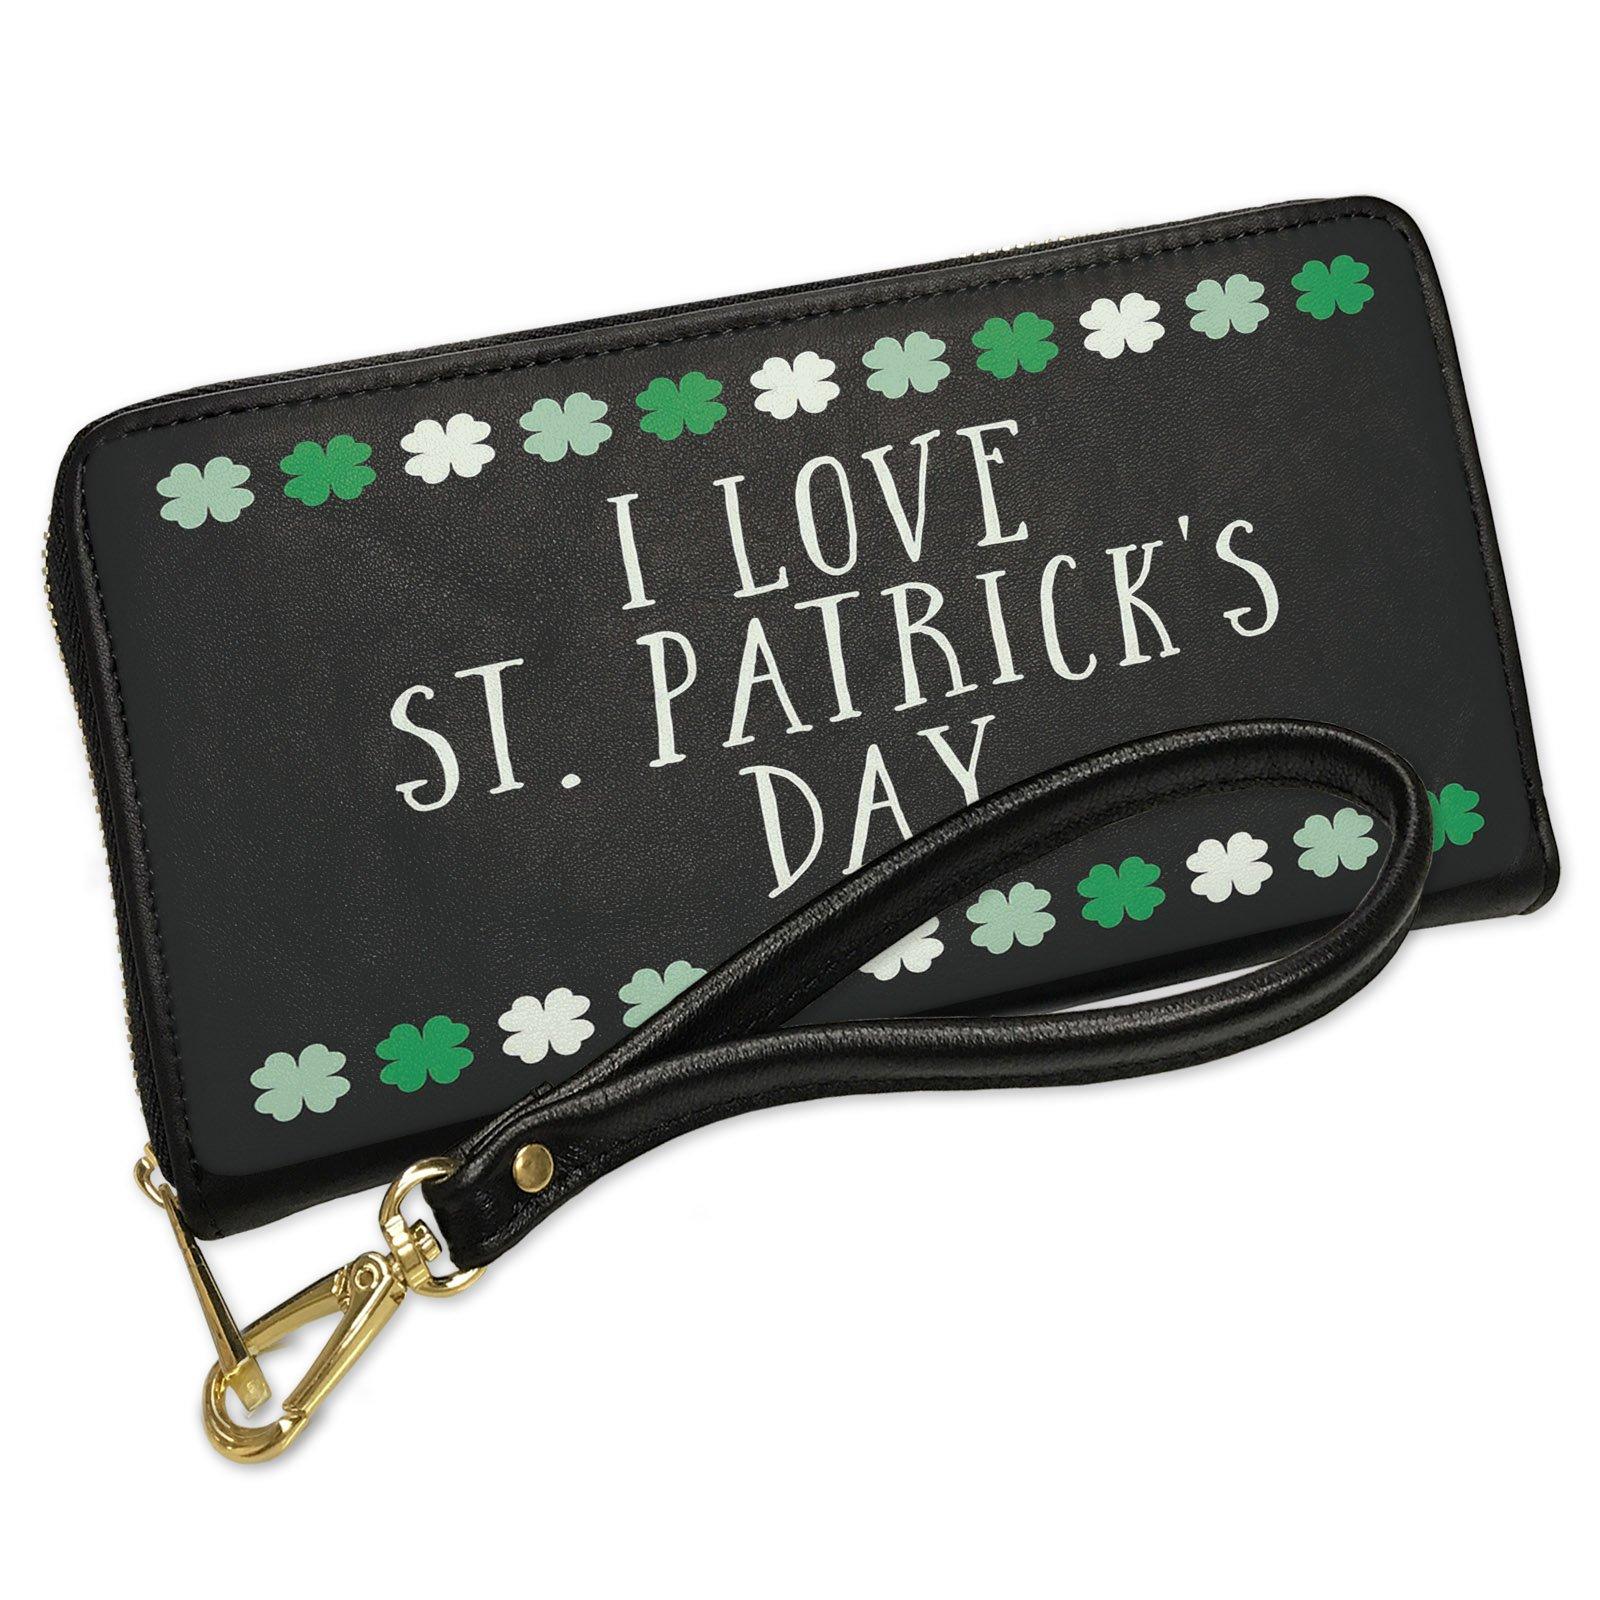 Wallet Clutch I Love St. Patrick's Day St. Patrick's Day Cute Shamrocks with Removable Wristlet Strap Neonblond